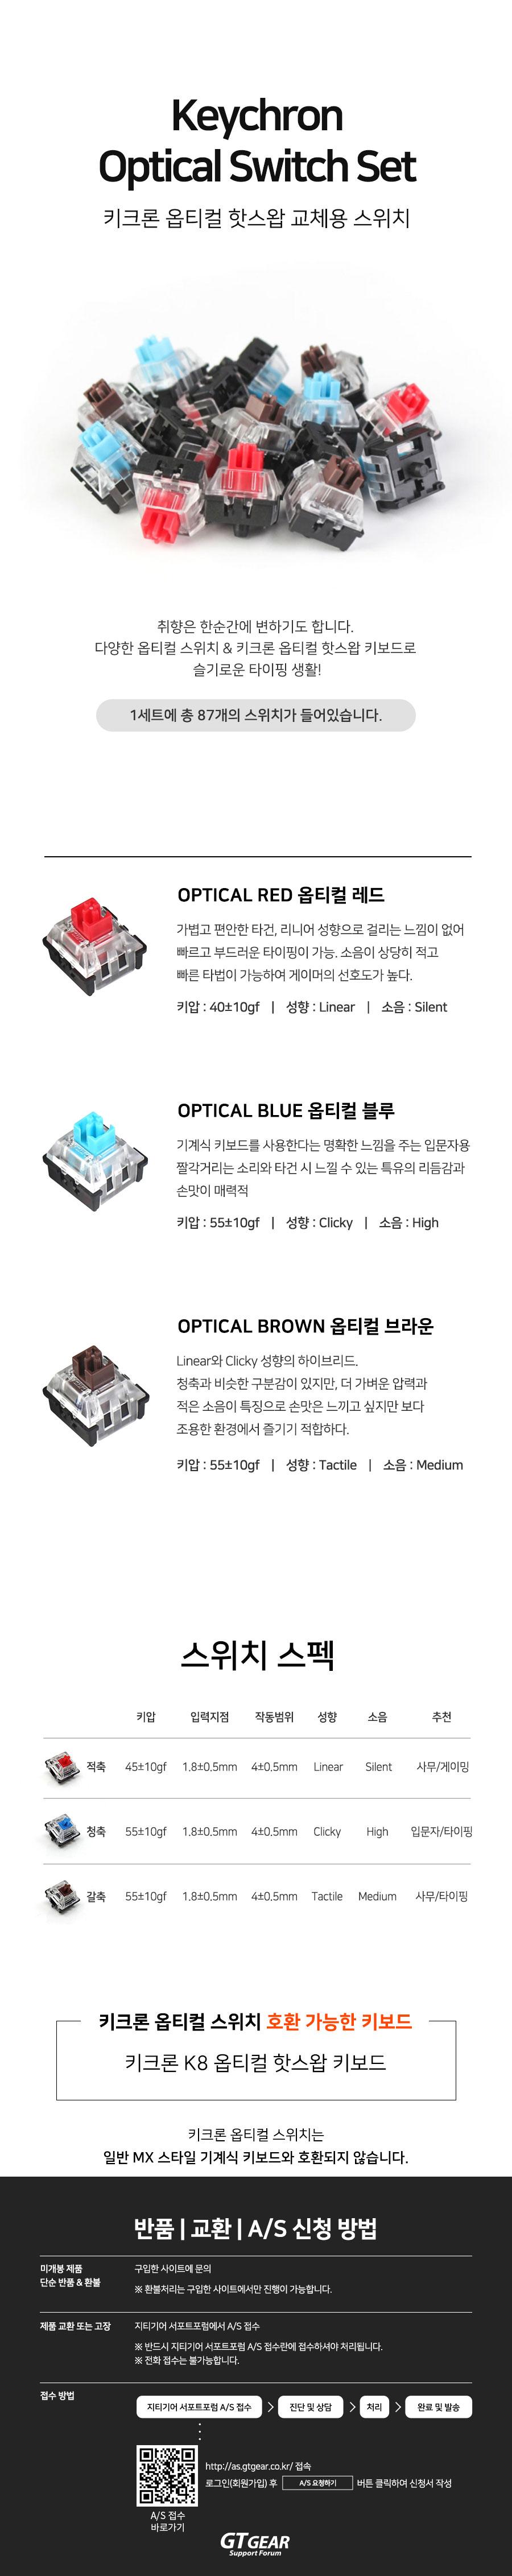 Keychron Optical Switch Set (87개, 청축)